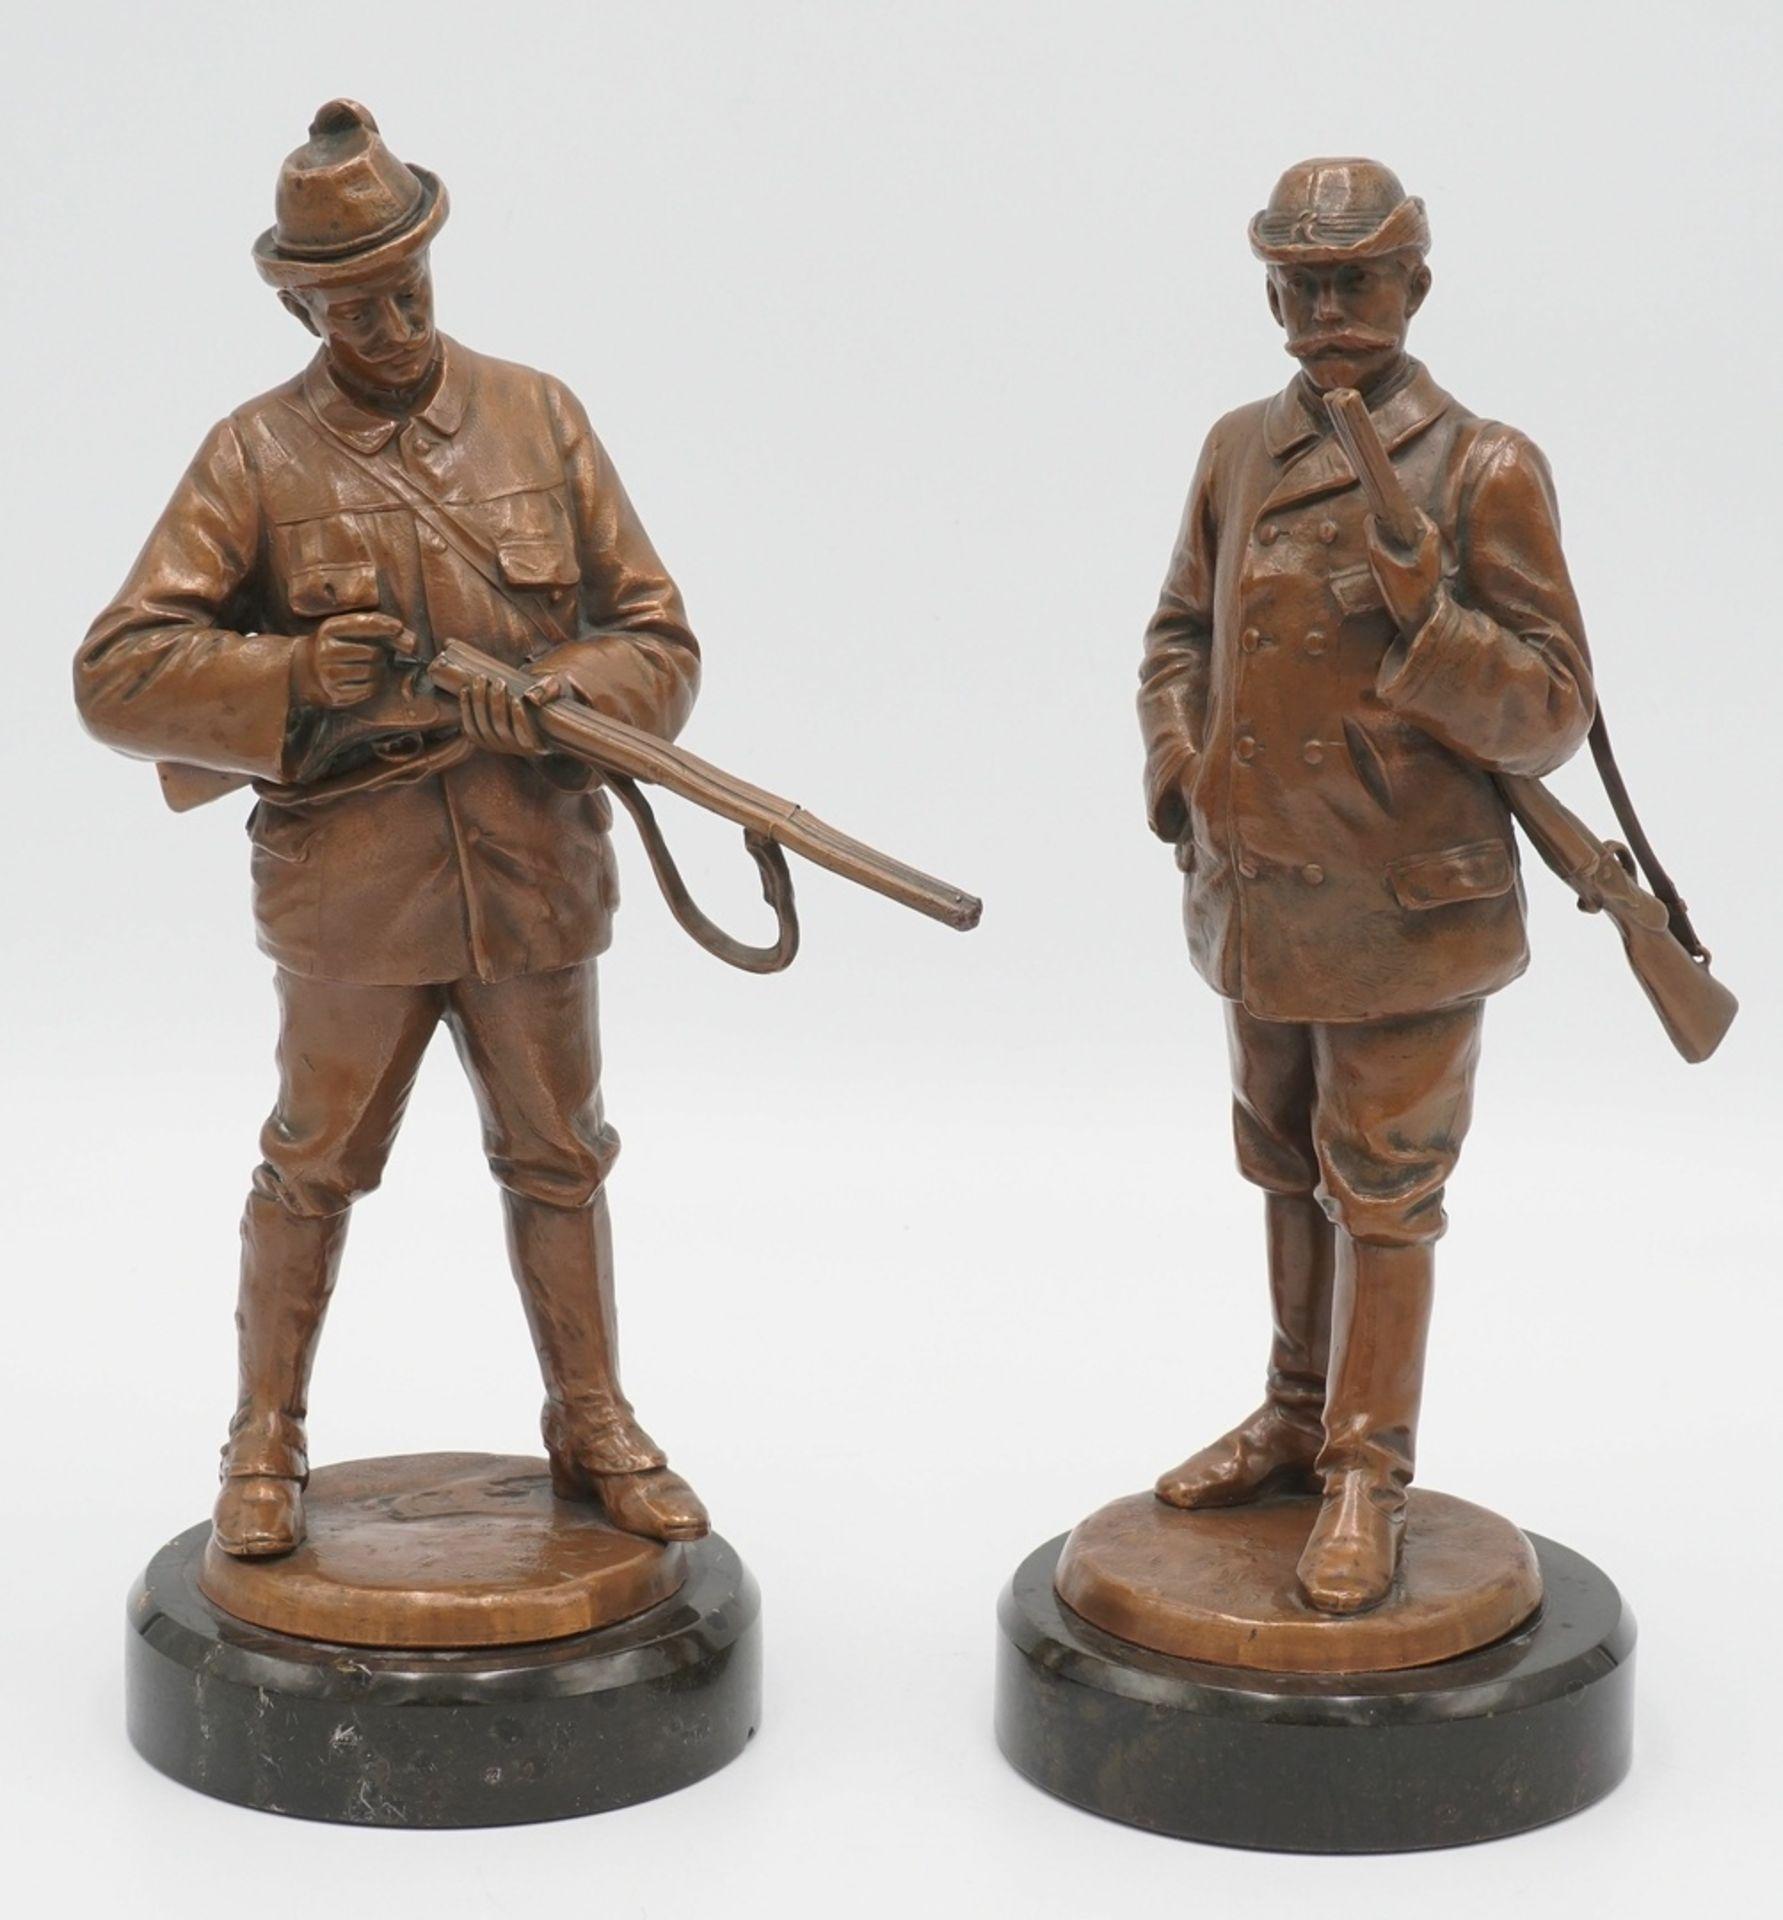 Zwei Jäger-Figuren, um 1900